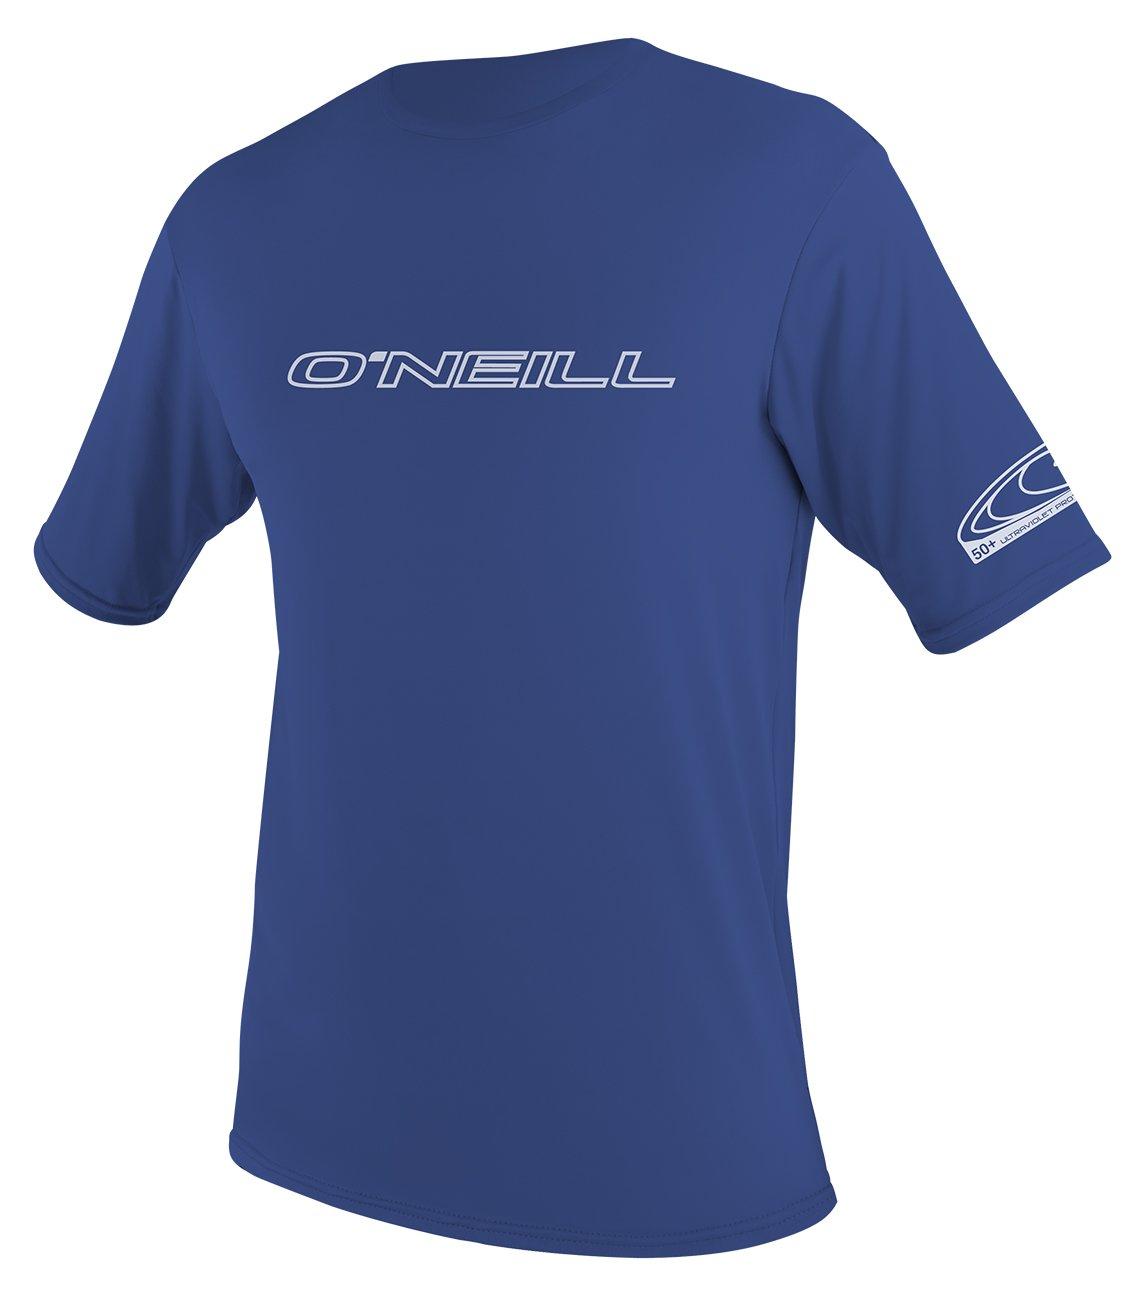 O'Neill   Men's Basic Skins UPF 50+ Short Sleeve Sun Shirt,Pacific,Small